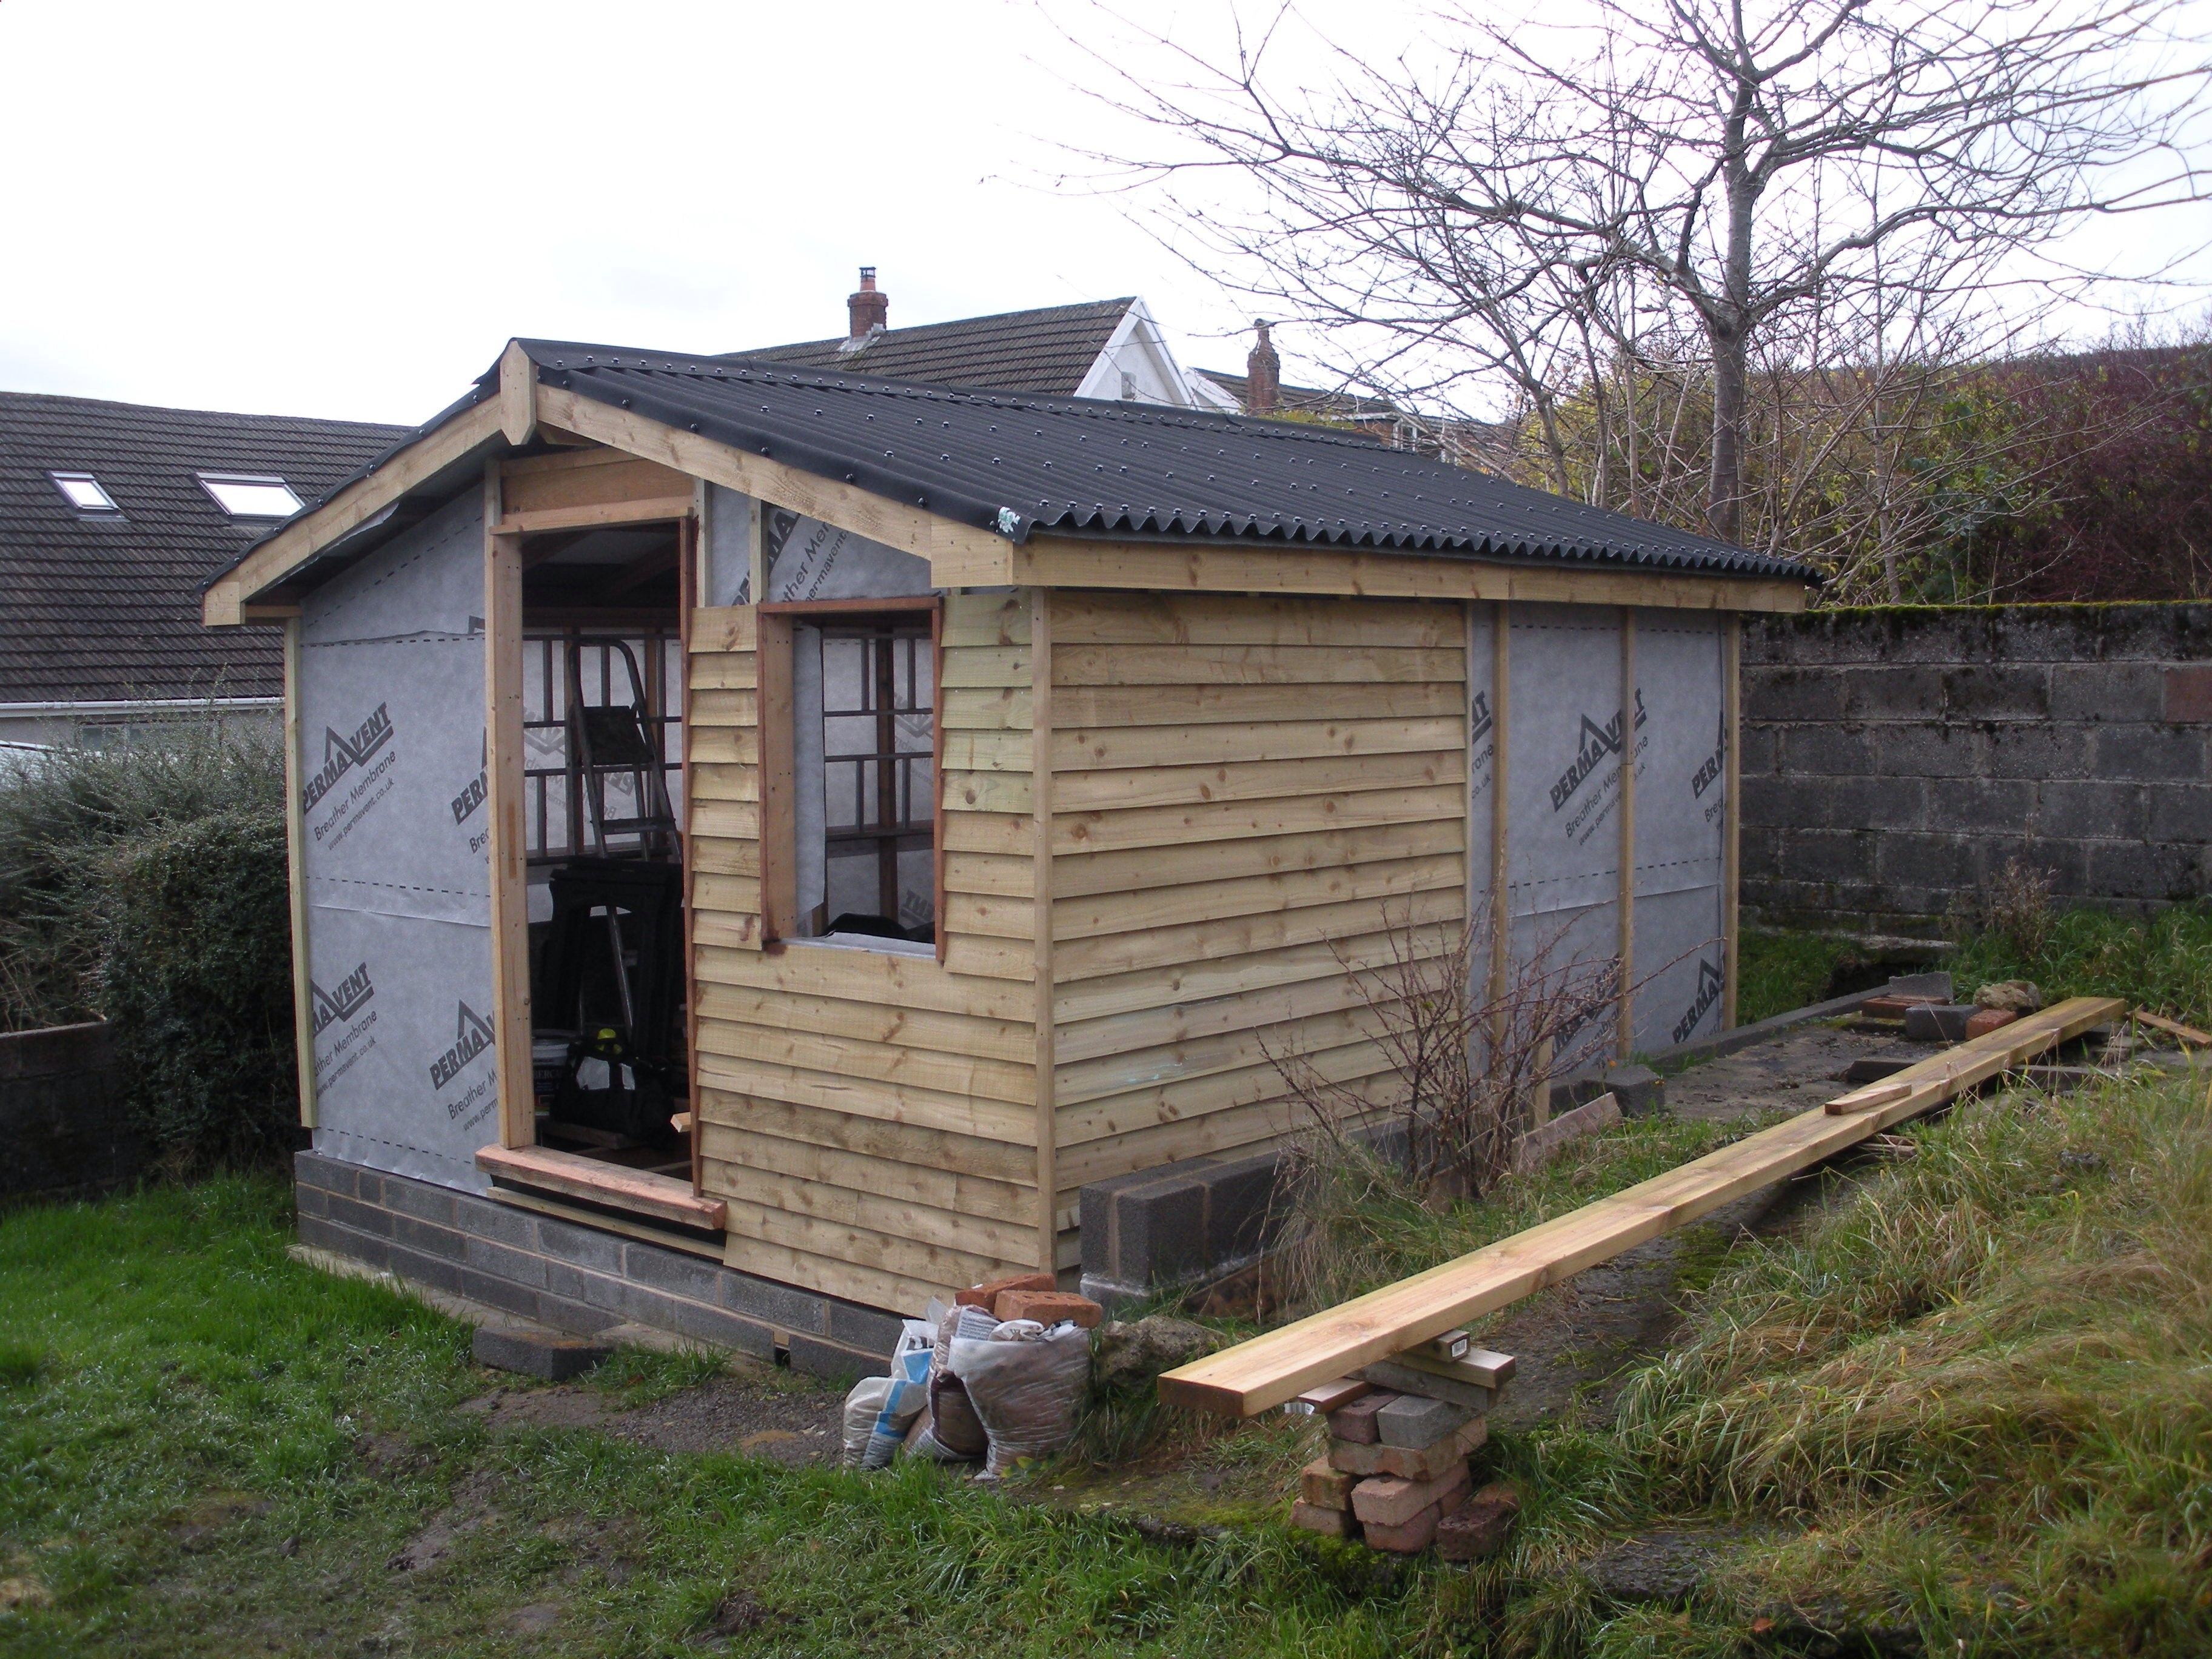 12x12 shed - Feather edge cladding frame #12x12ShedPlan   12x12 Shed ...